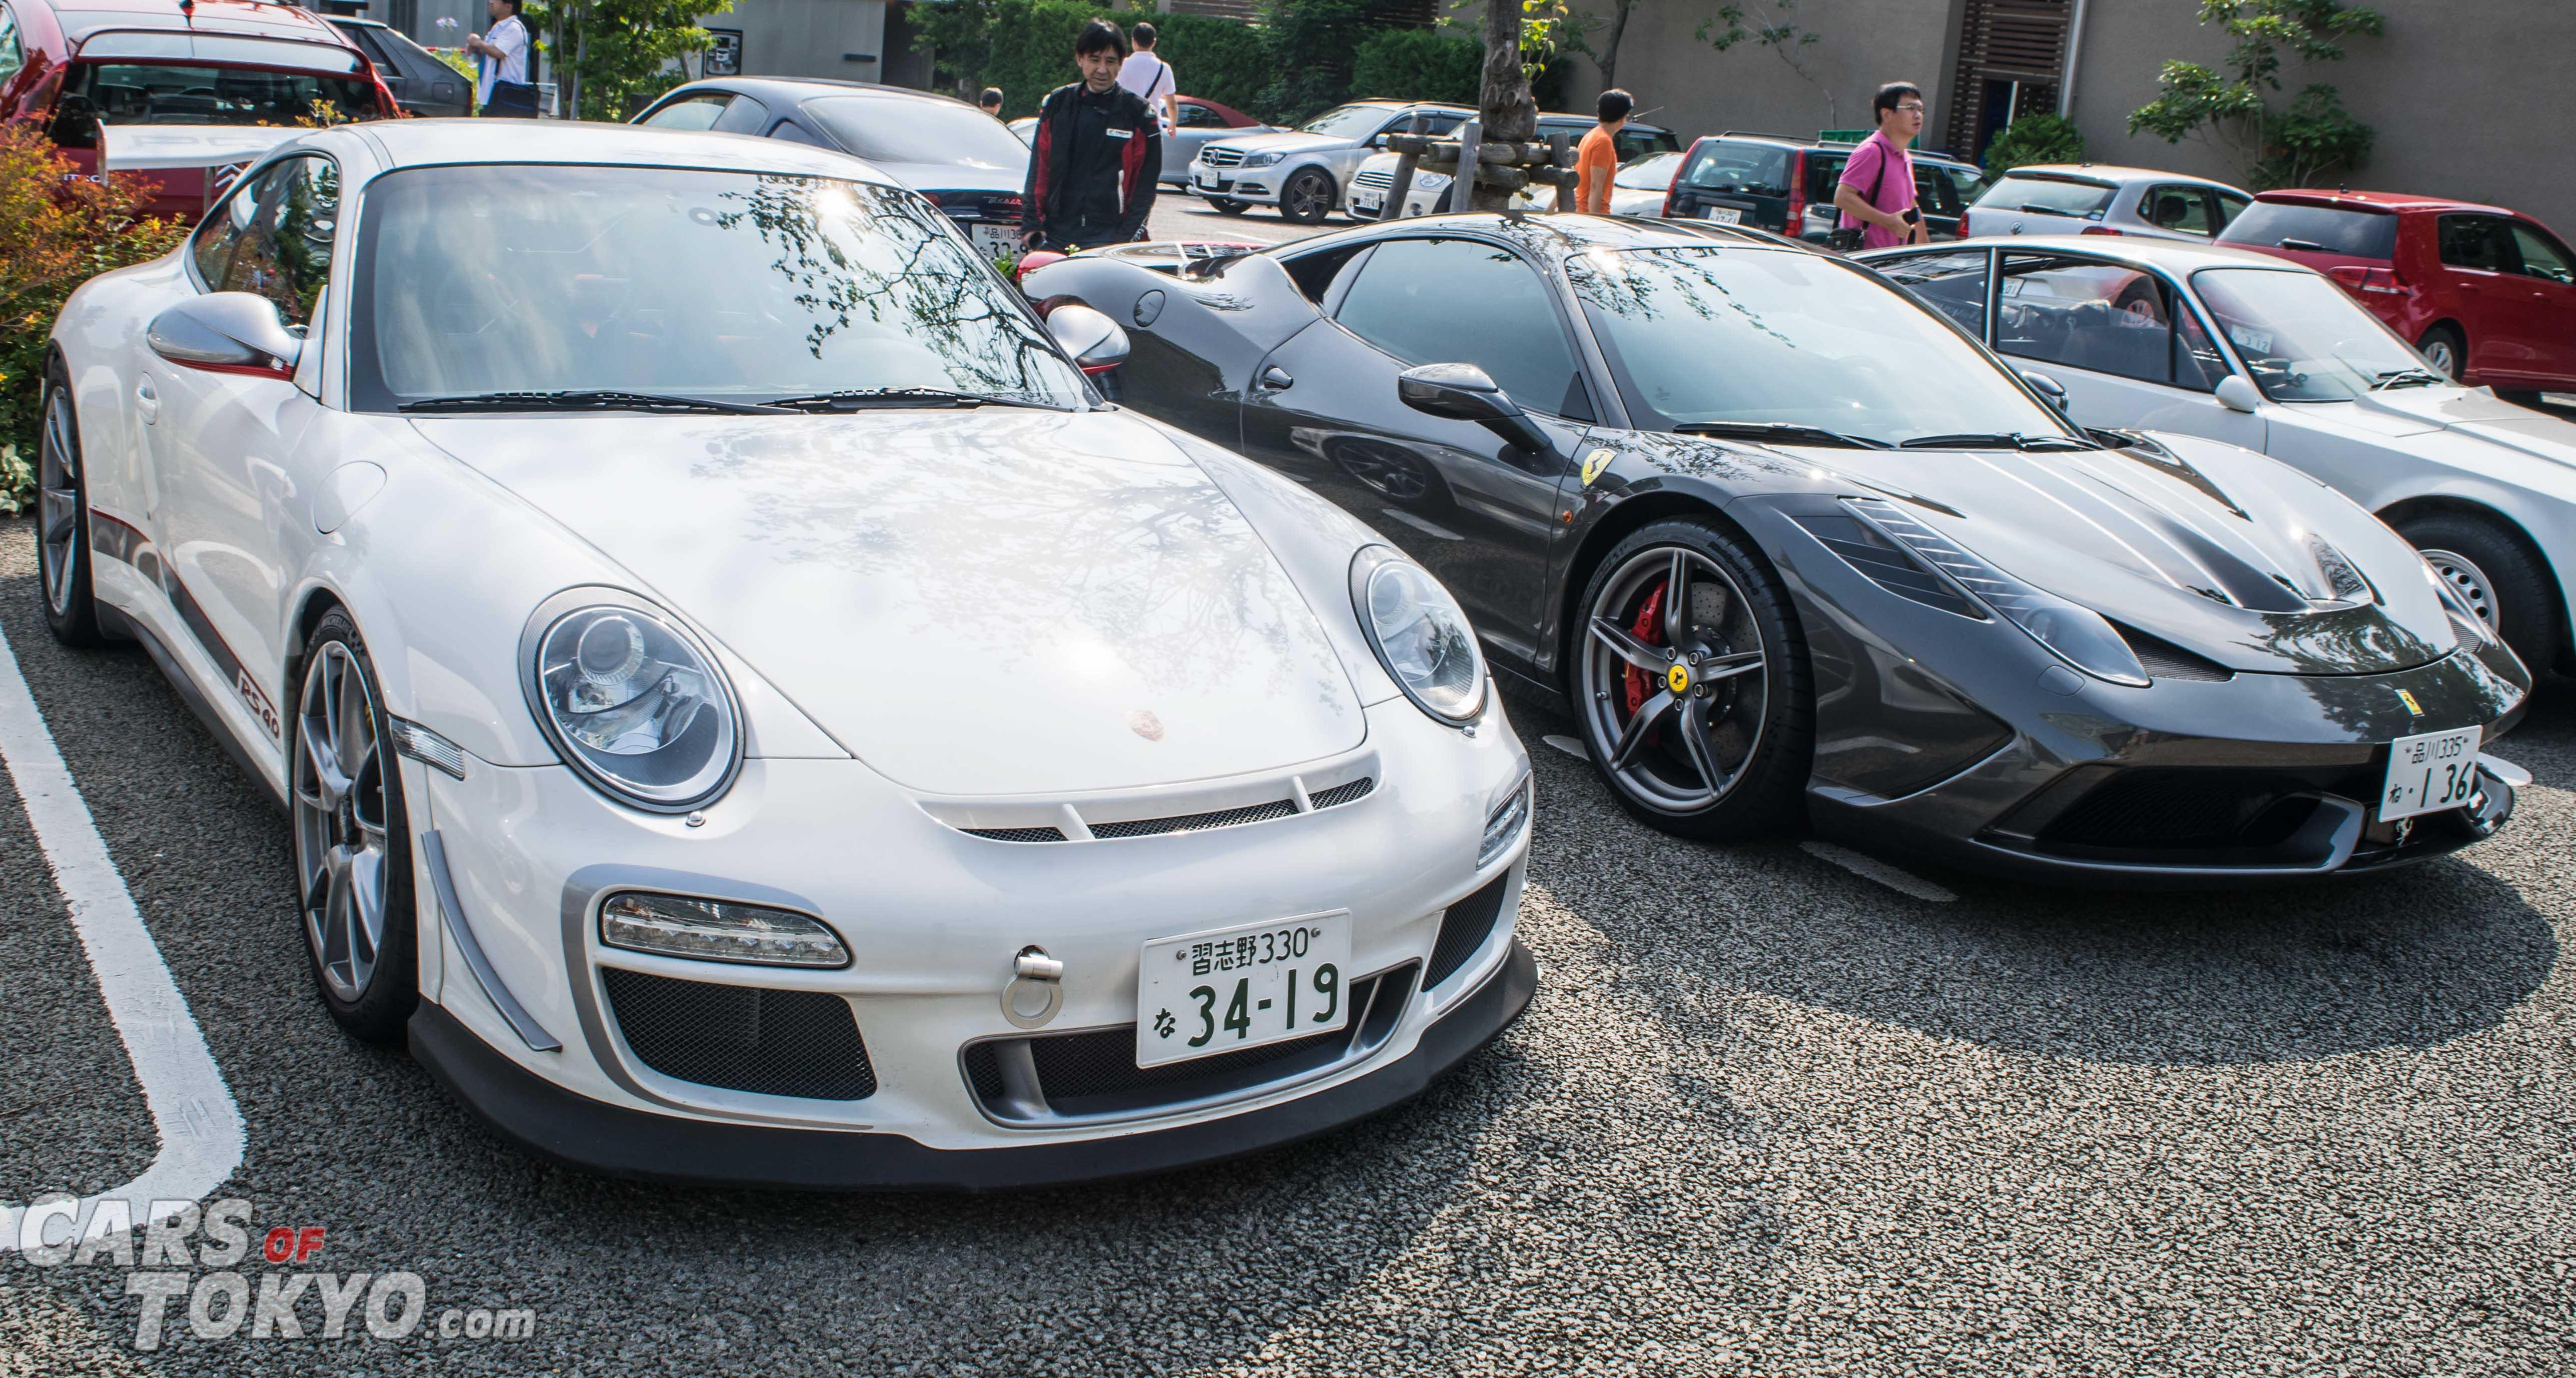 Cars of Tokyo Daikanyama Porsche 911 GT3 RS 4.0 & Ferrari 458 Speciale